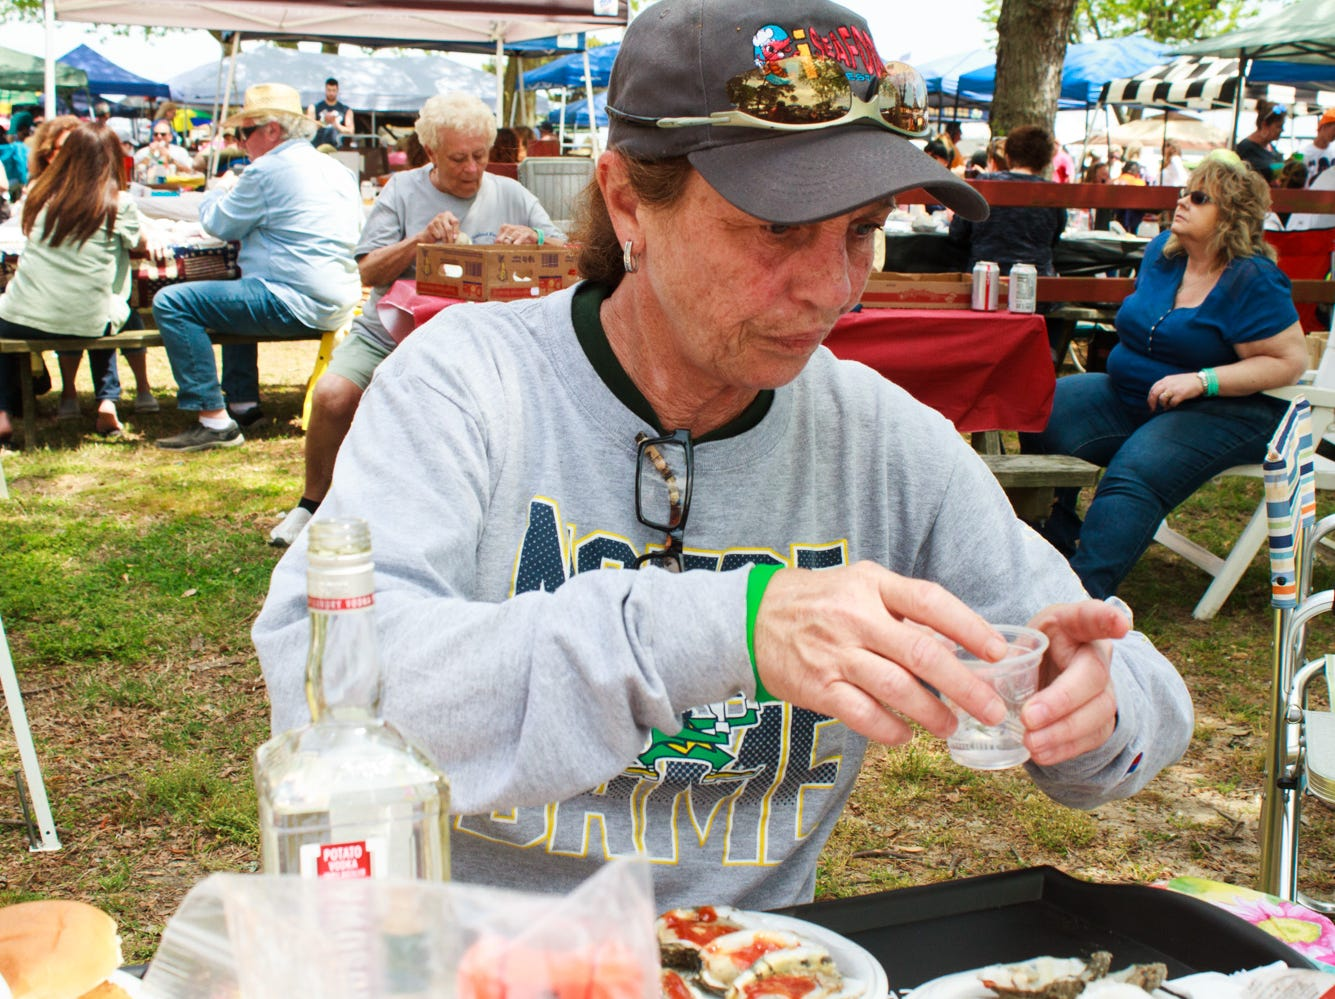 Lisa Van Fossen of Conshohocken, PA prepares oyster shots on Saturday, May 4, 2019 at the Chincoteague Seafood Festival in Chincoteague, VA.